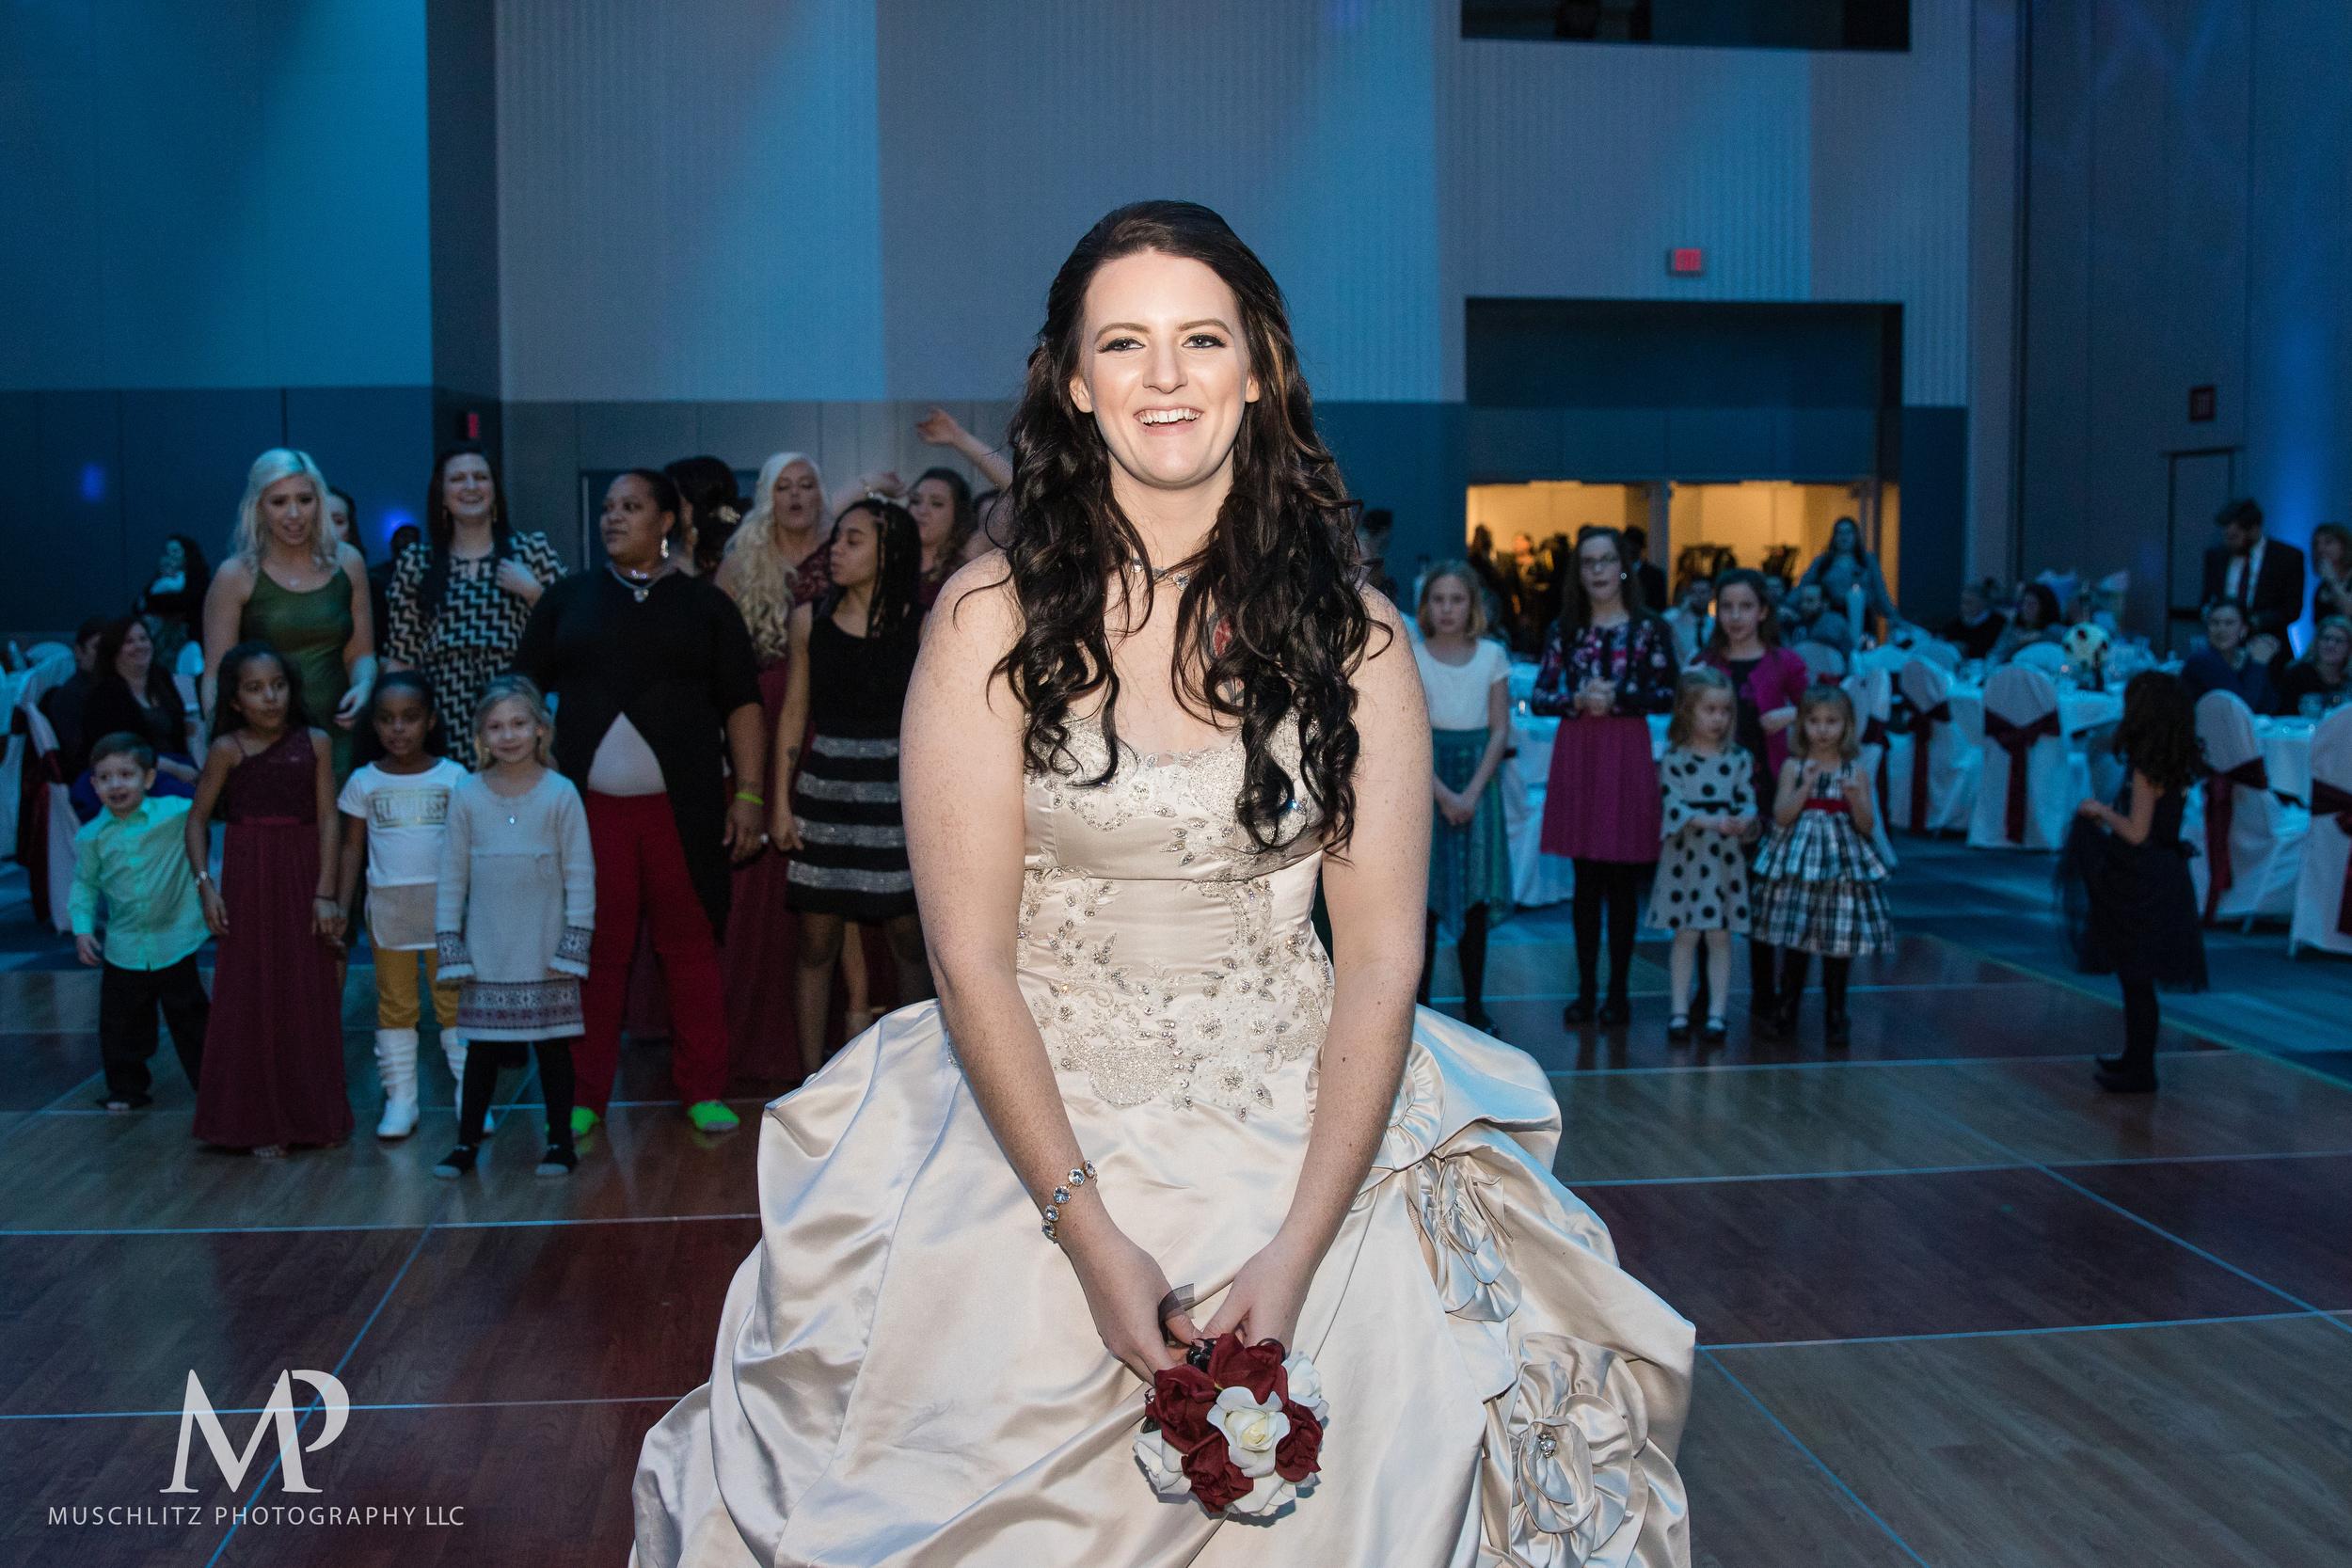 greater-columbus-convention-center-winter-wedding-ceremony-reception-portraits-columbus-ohio-muschlitz-photography-073.JPG